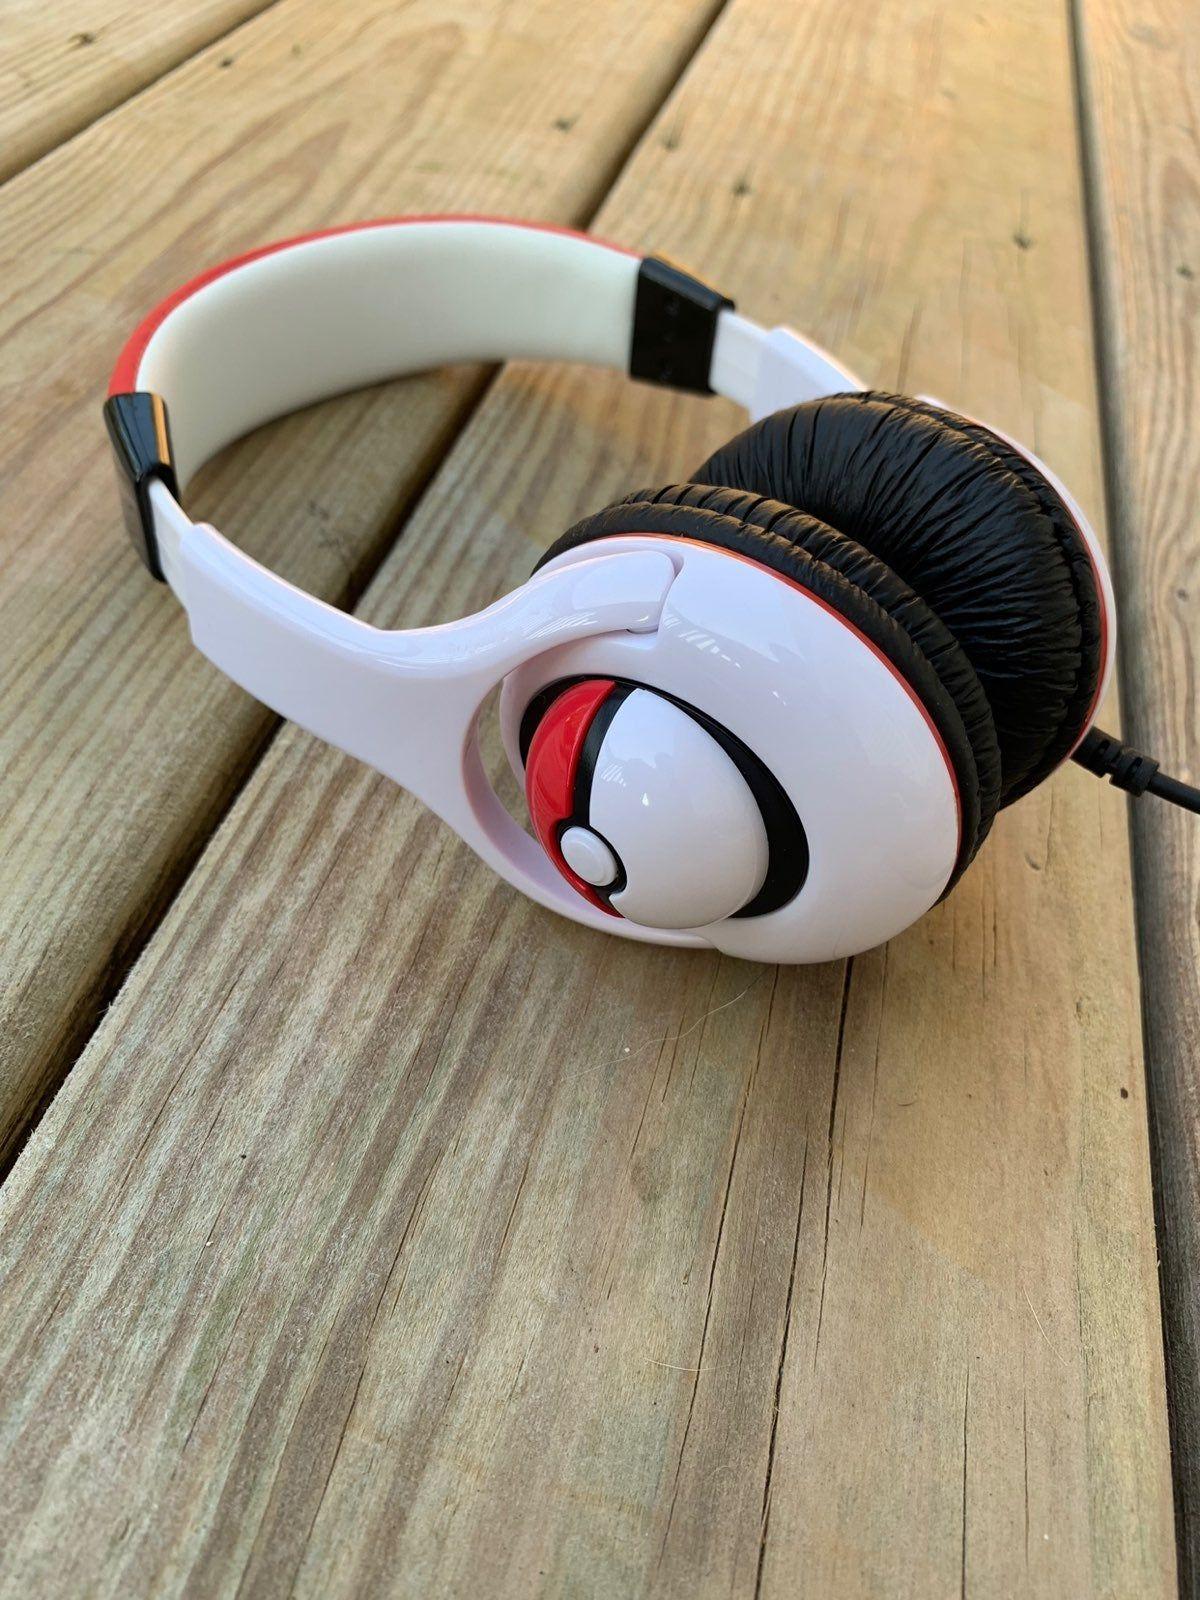 Pokémon Headphones in 2020 Creative t shirt design